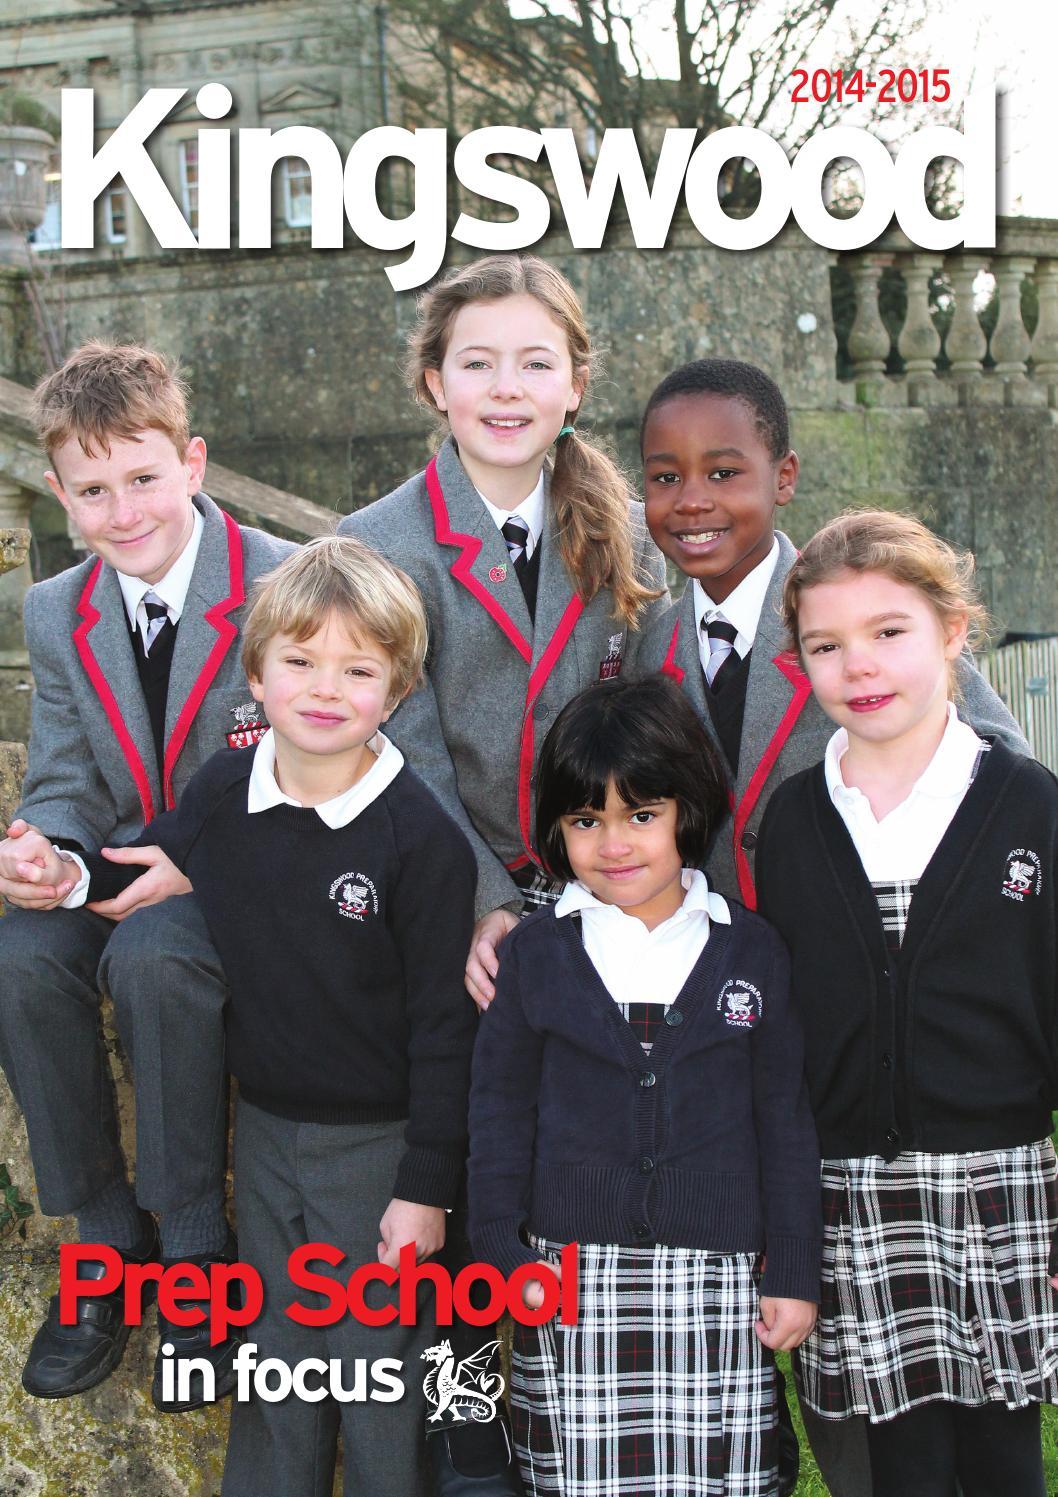 kingswood prep school magazine 201415 by kingswood school